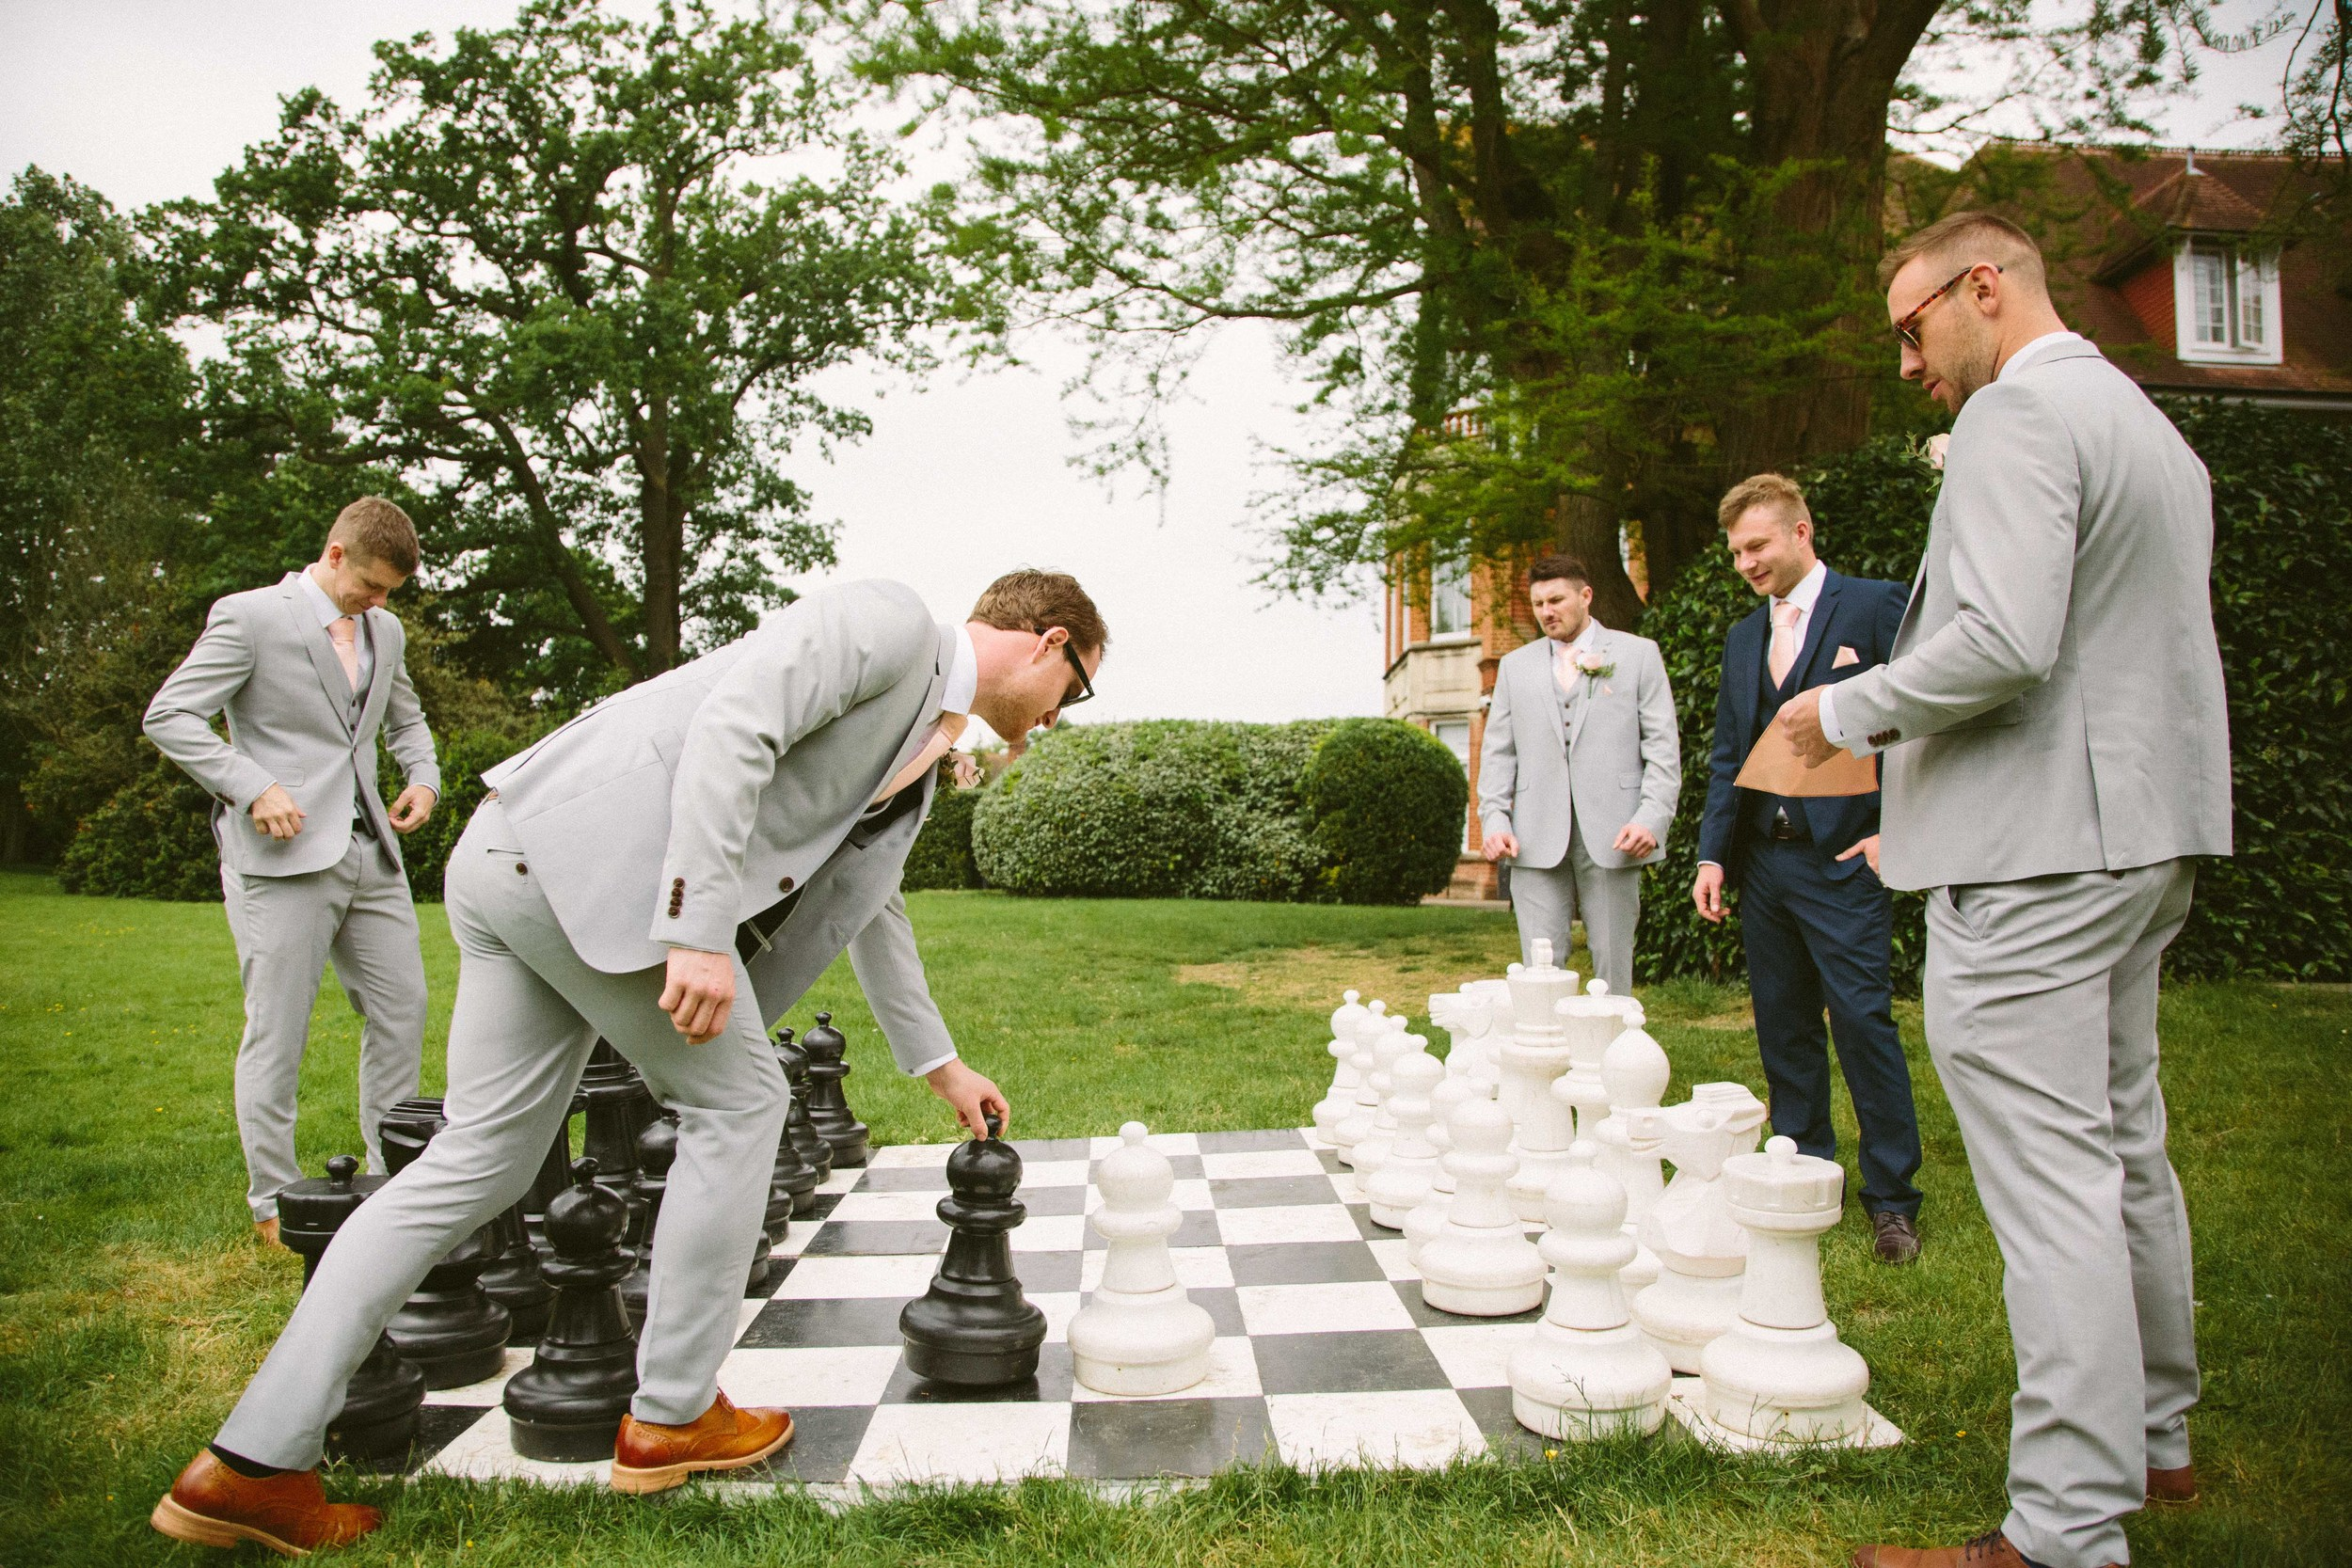 Woodlands-Park-Hotel-Cobham-Surrey-wedding-7